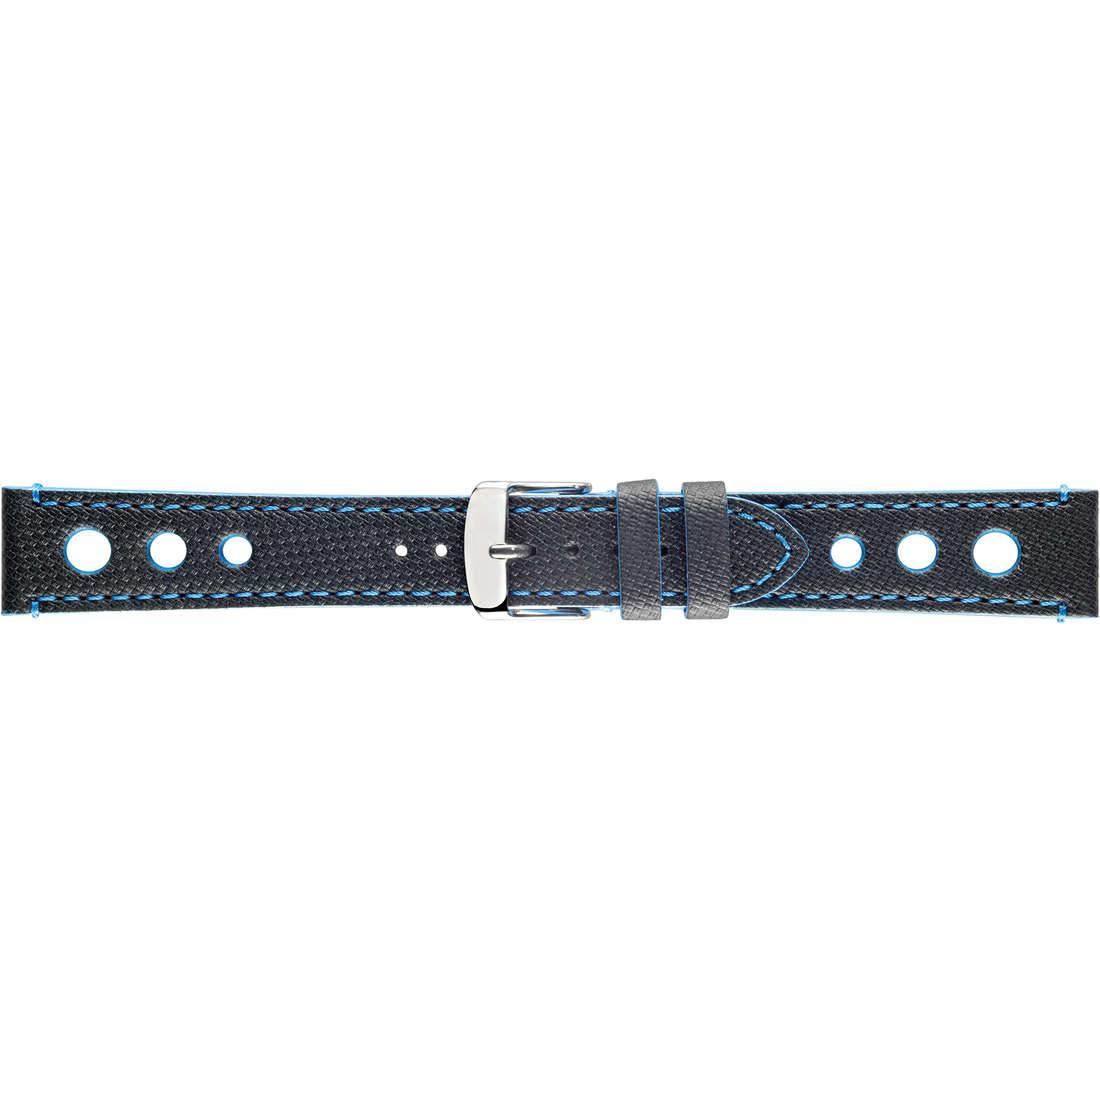 montre bande de montres homme Morellato Linea Sport A01X4498B24866CR20